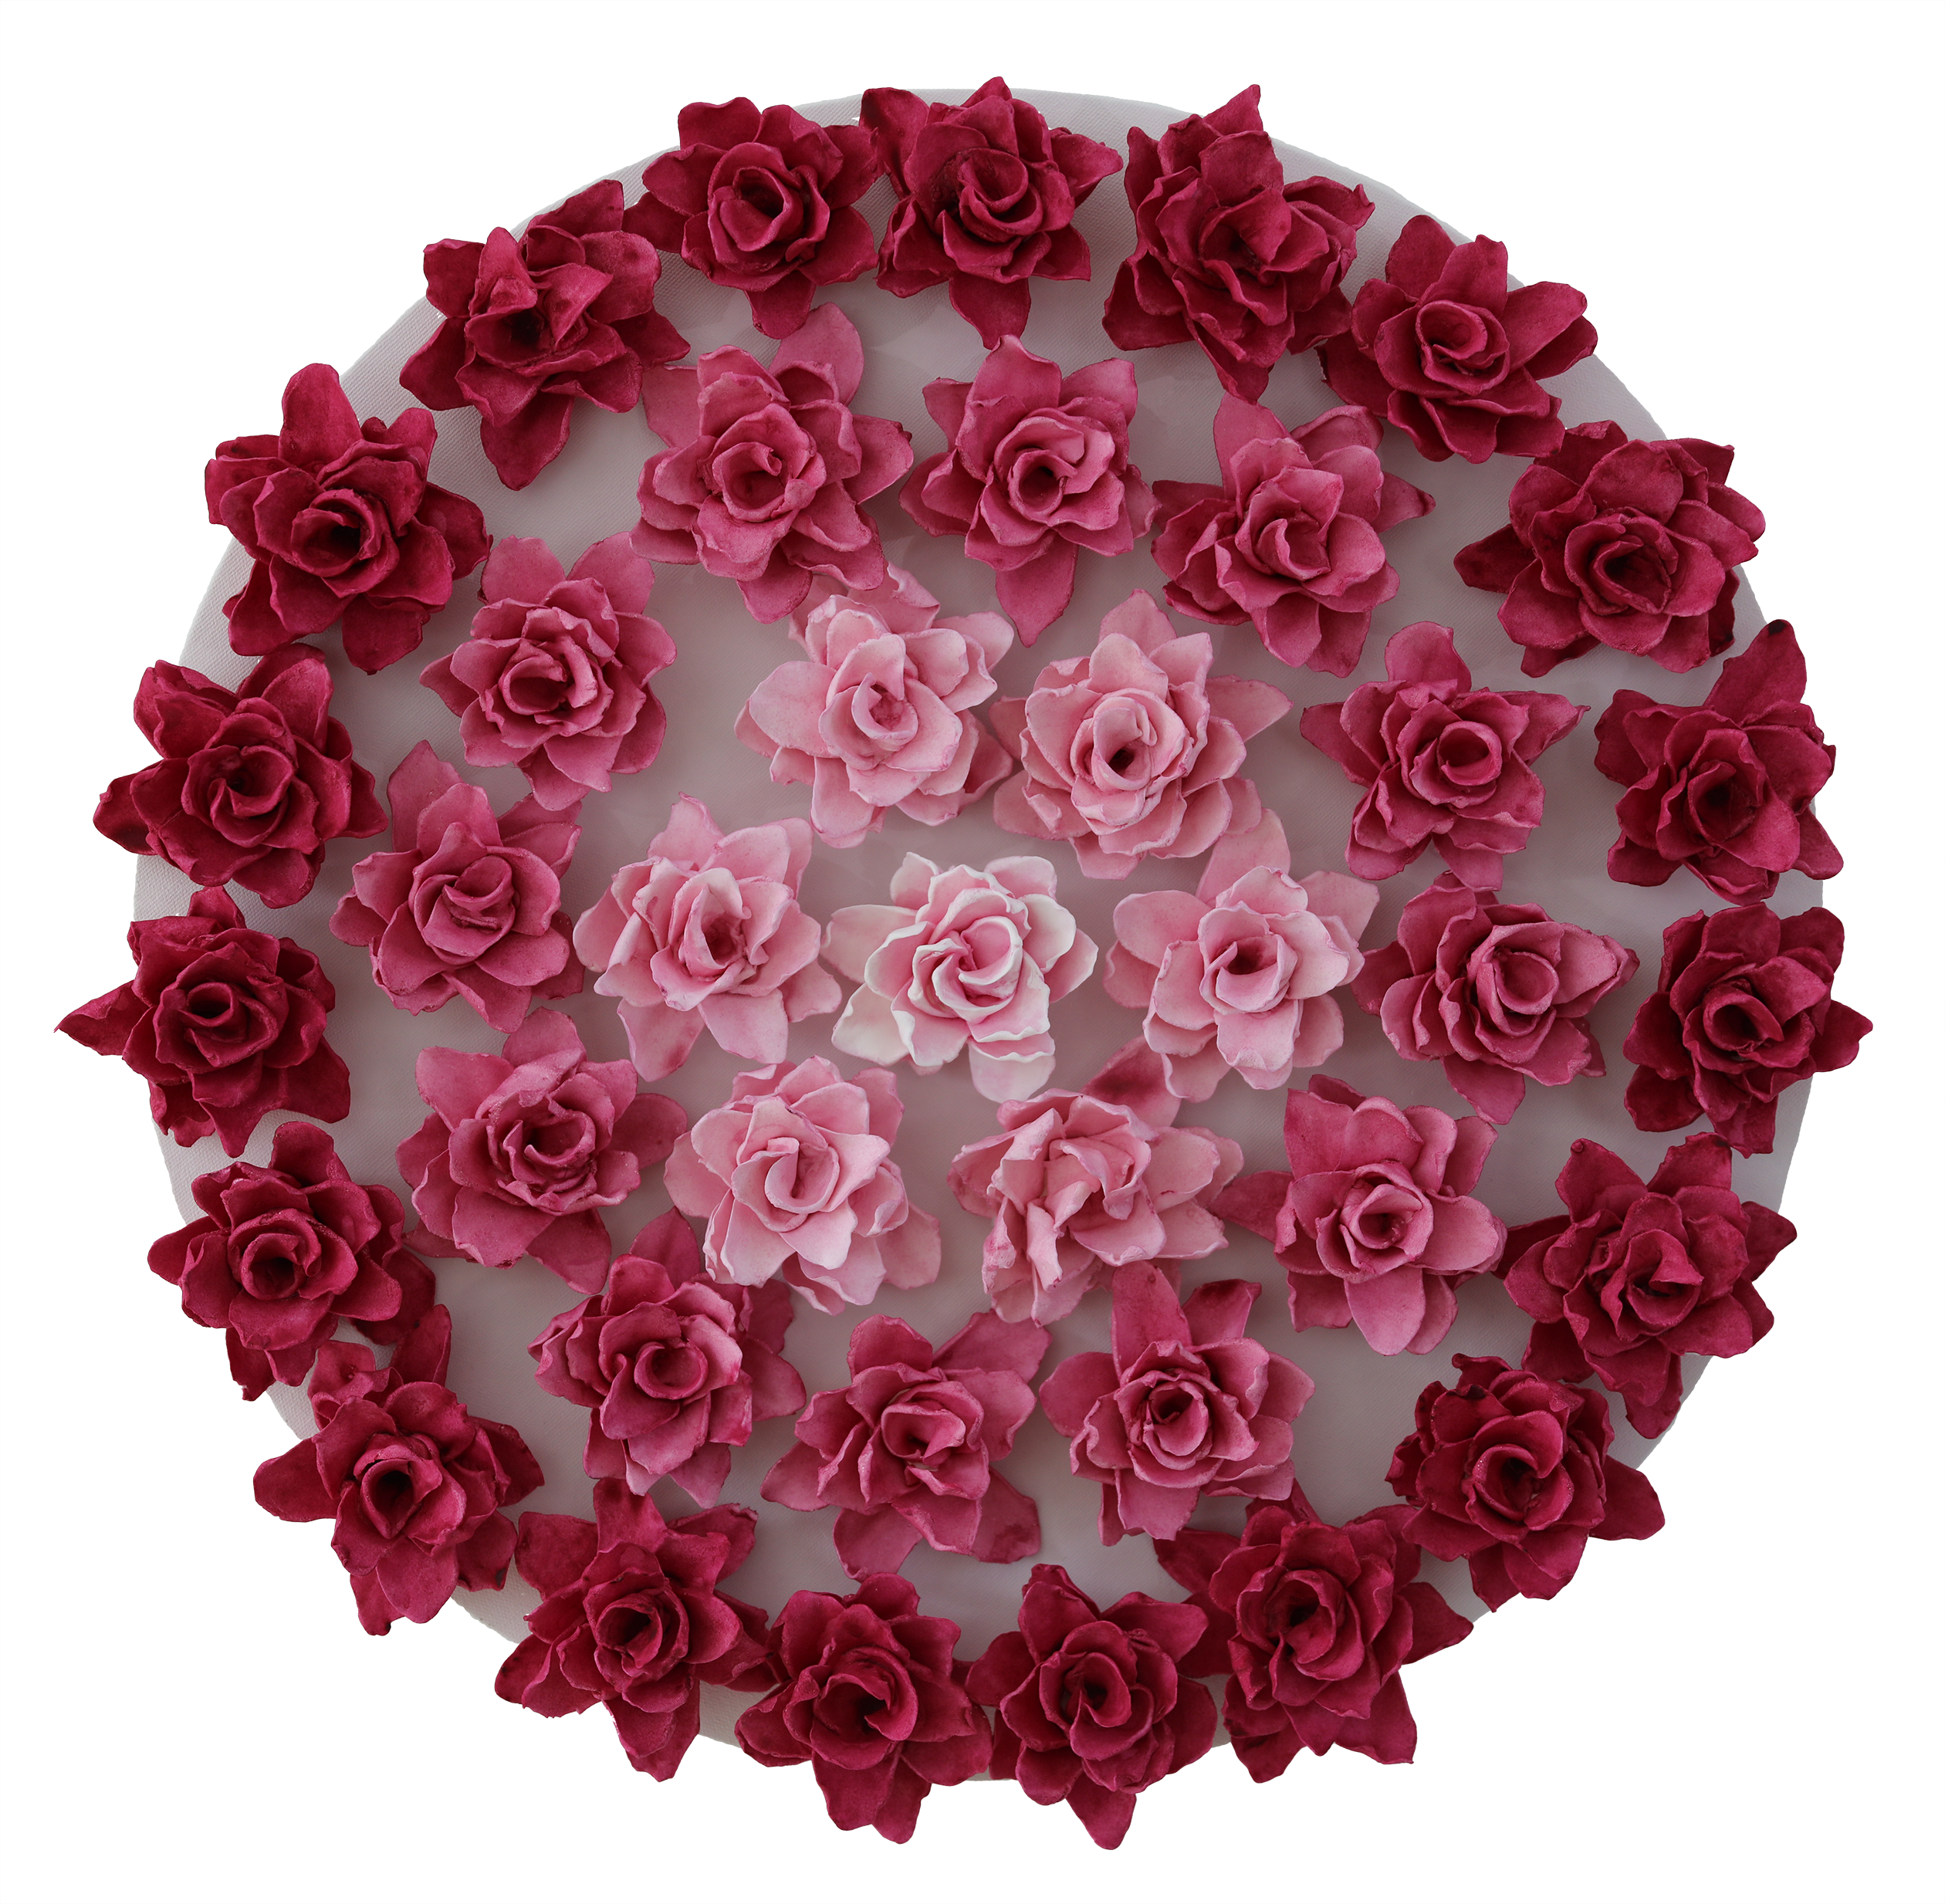 Mandala rosy orig white background mysug8